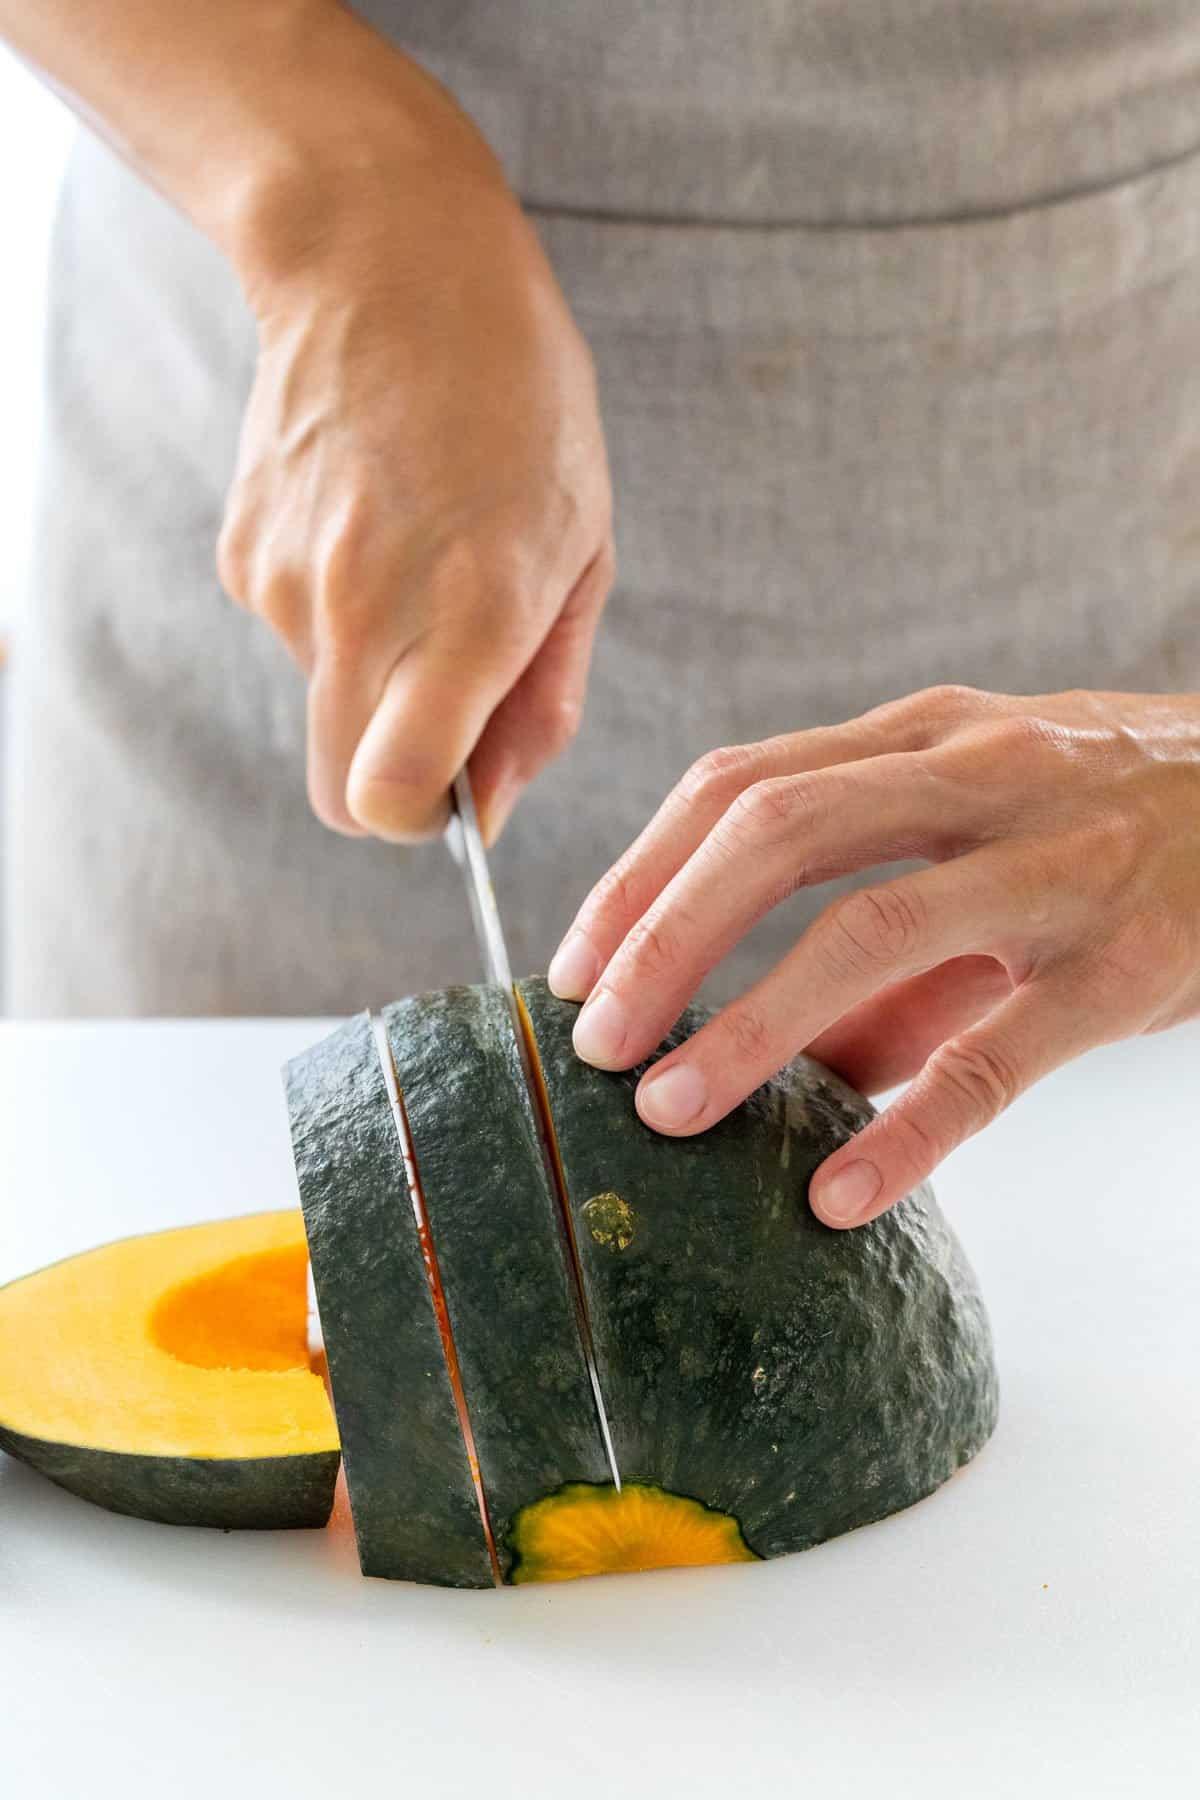 Slicing kabocha squash into smaller pieces